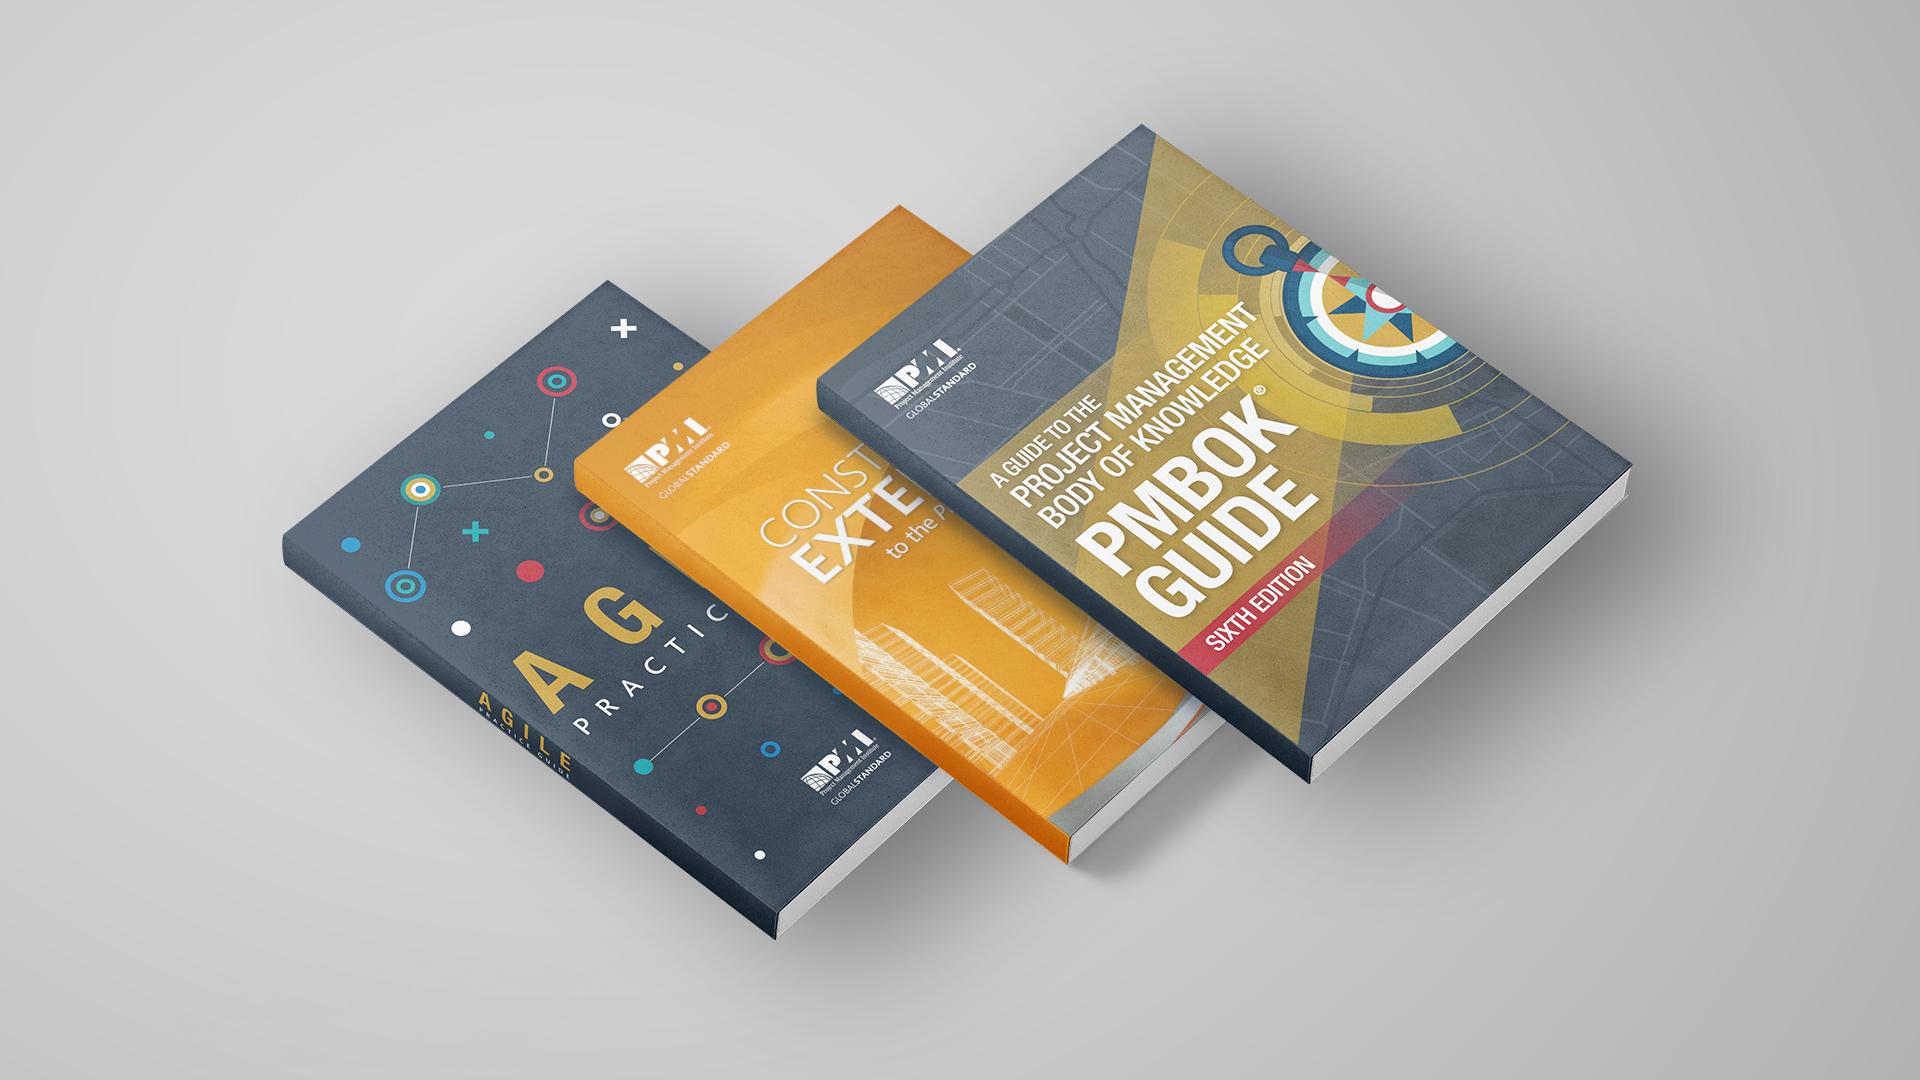 Project management books